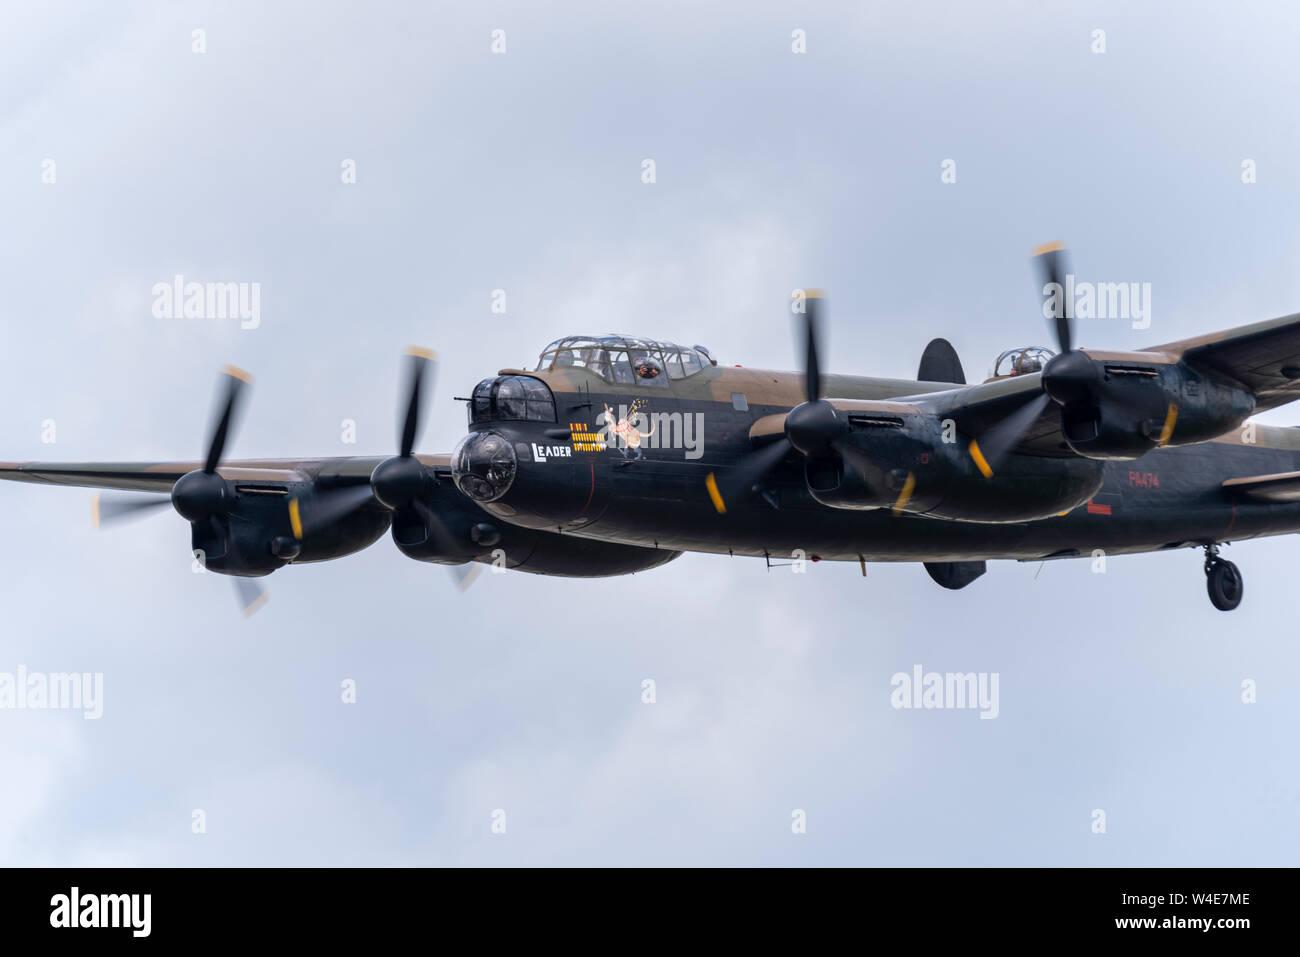 Royal Air Force RAF die Schlacht um England Memorial Flight Avro Lancaster Bomber im Royal International Air Tattoo Airshow, RAF Fairford, Cotswolds, UK. Stockfoto